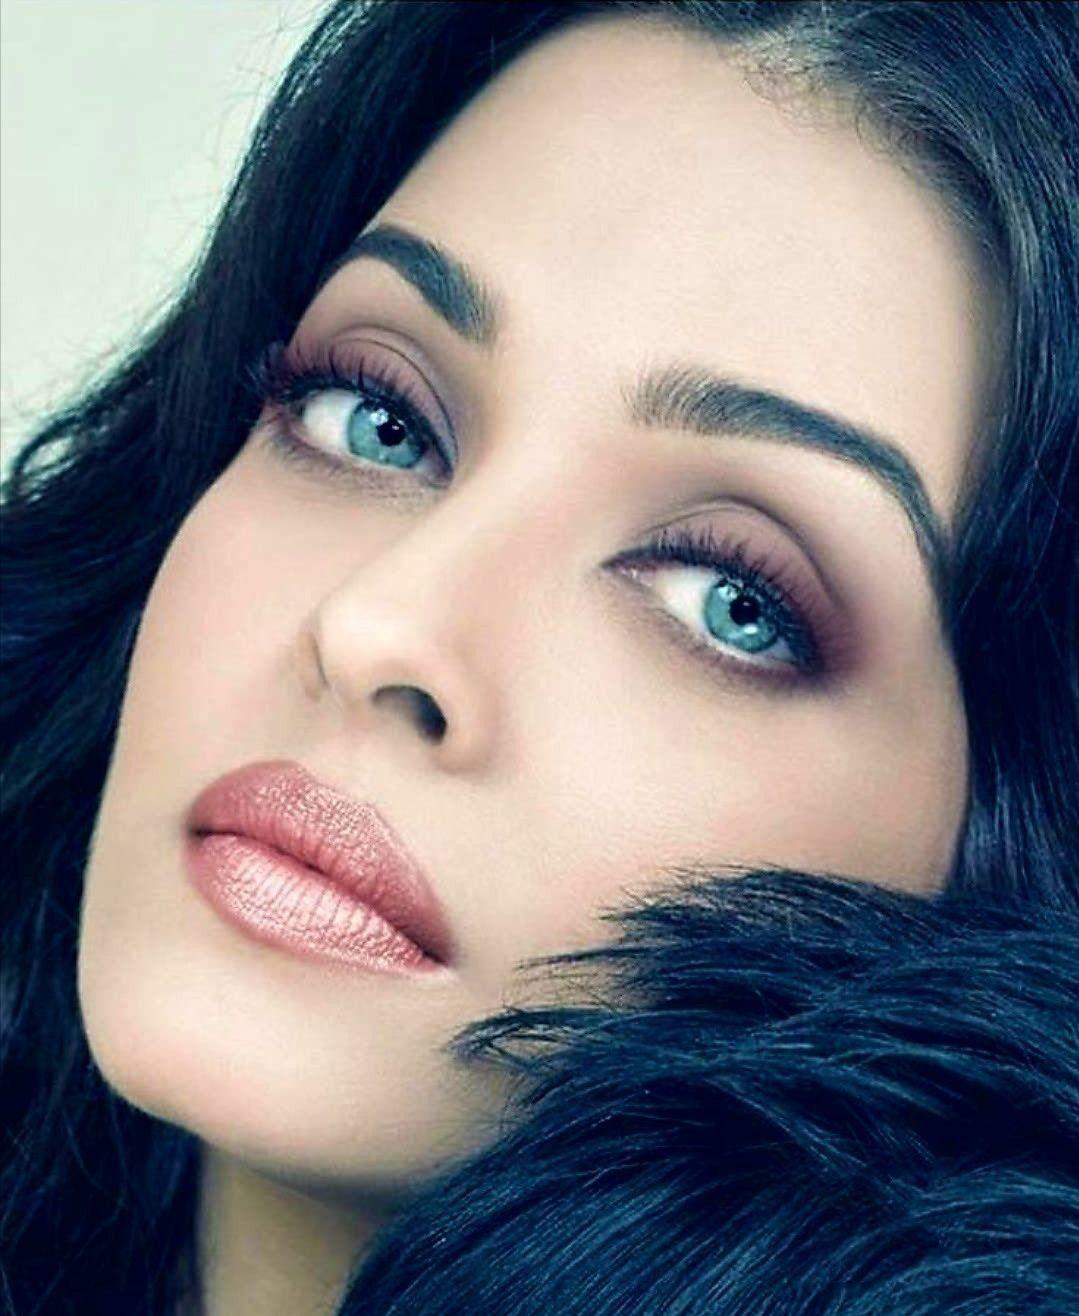 Aishwarya Rai Eyes Pictures Aishwarya Rai Makeup Aishwarya Rai Aishwarya Rai Bachchan